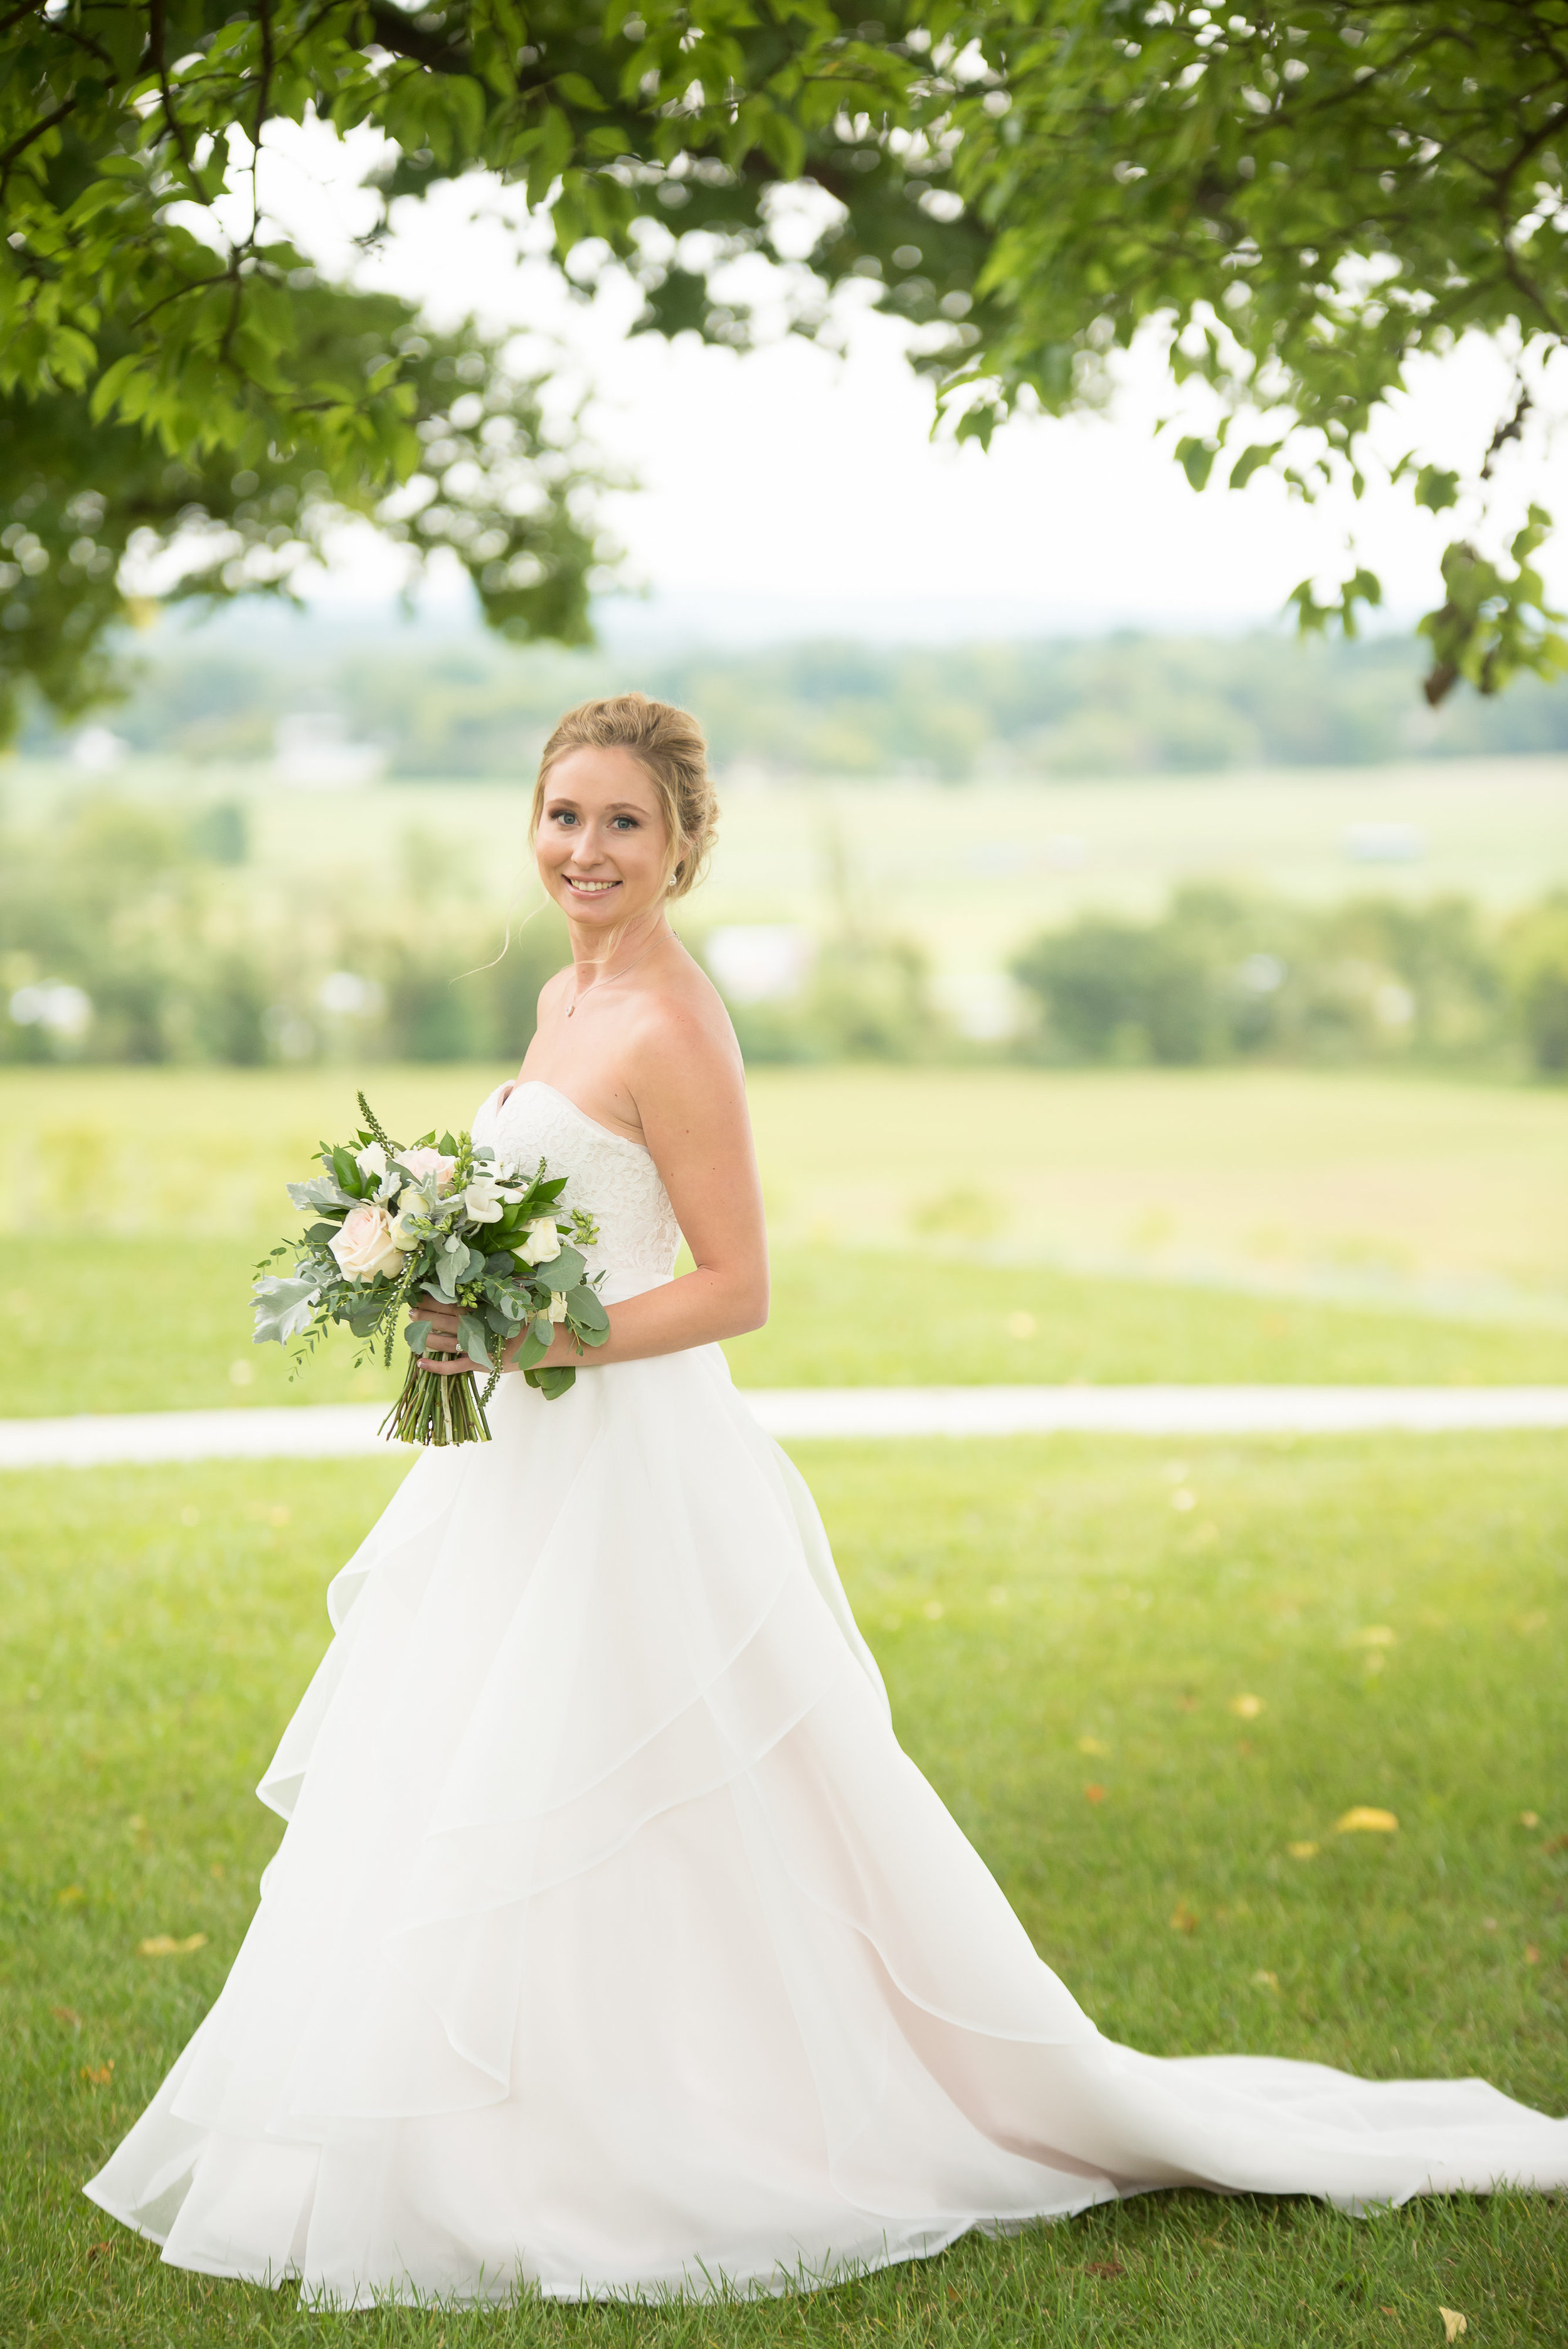 090117 MD Jocelyn Butrum - Ruthie Skillman Photography JBag LC-242.jpg